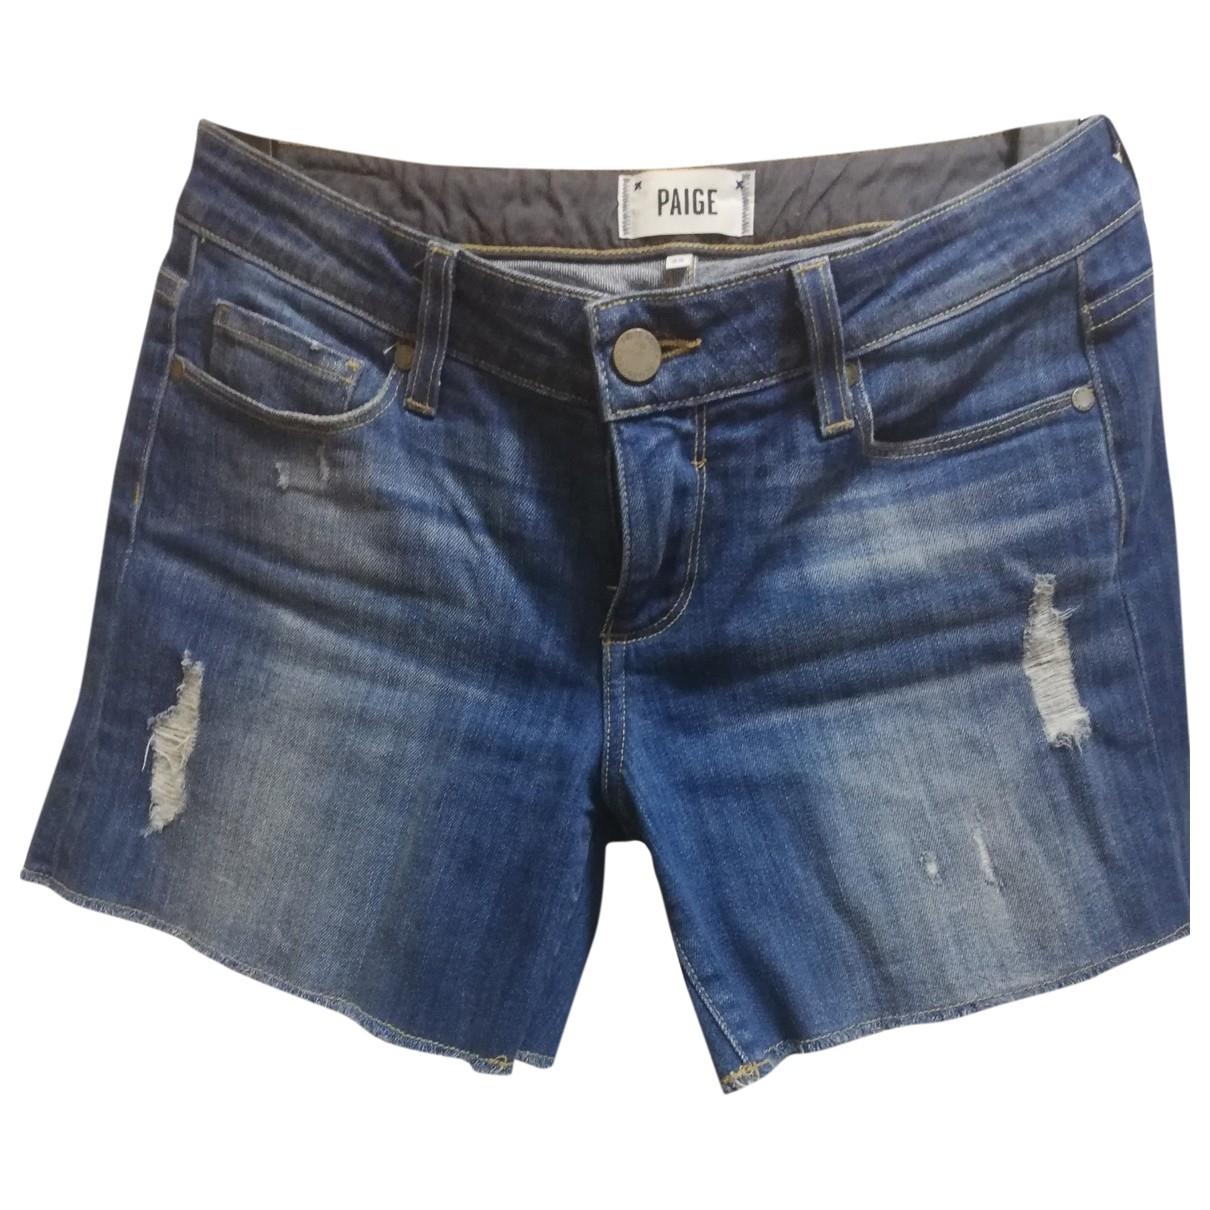 Paige Jeans \N Shorts in  Blau Denim - Jeans